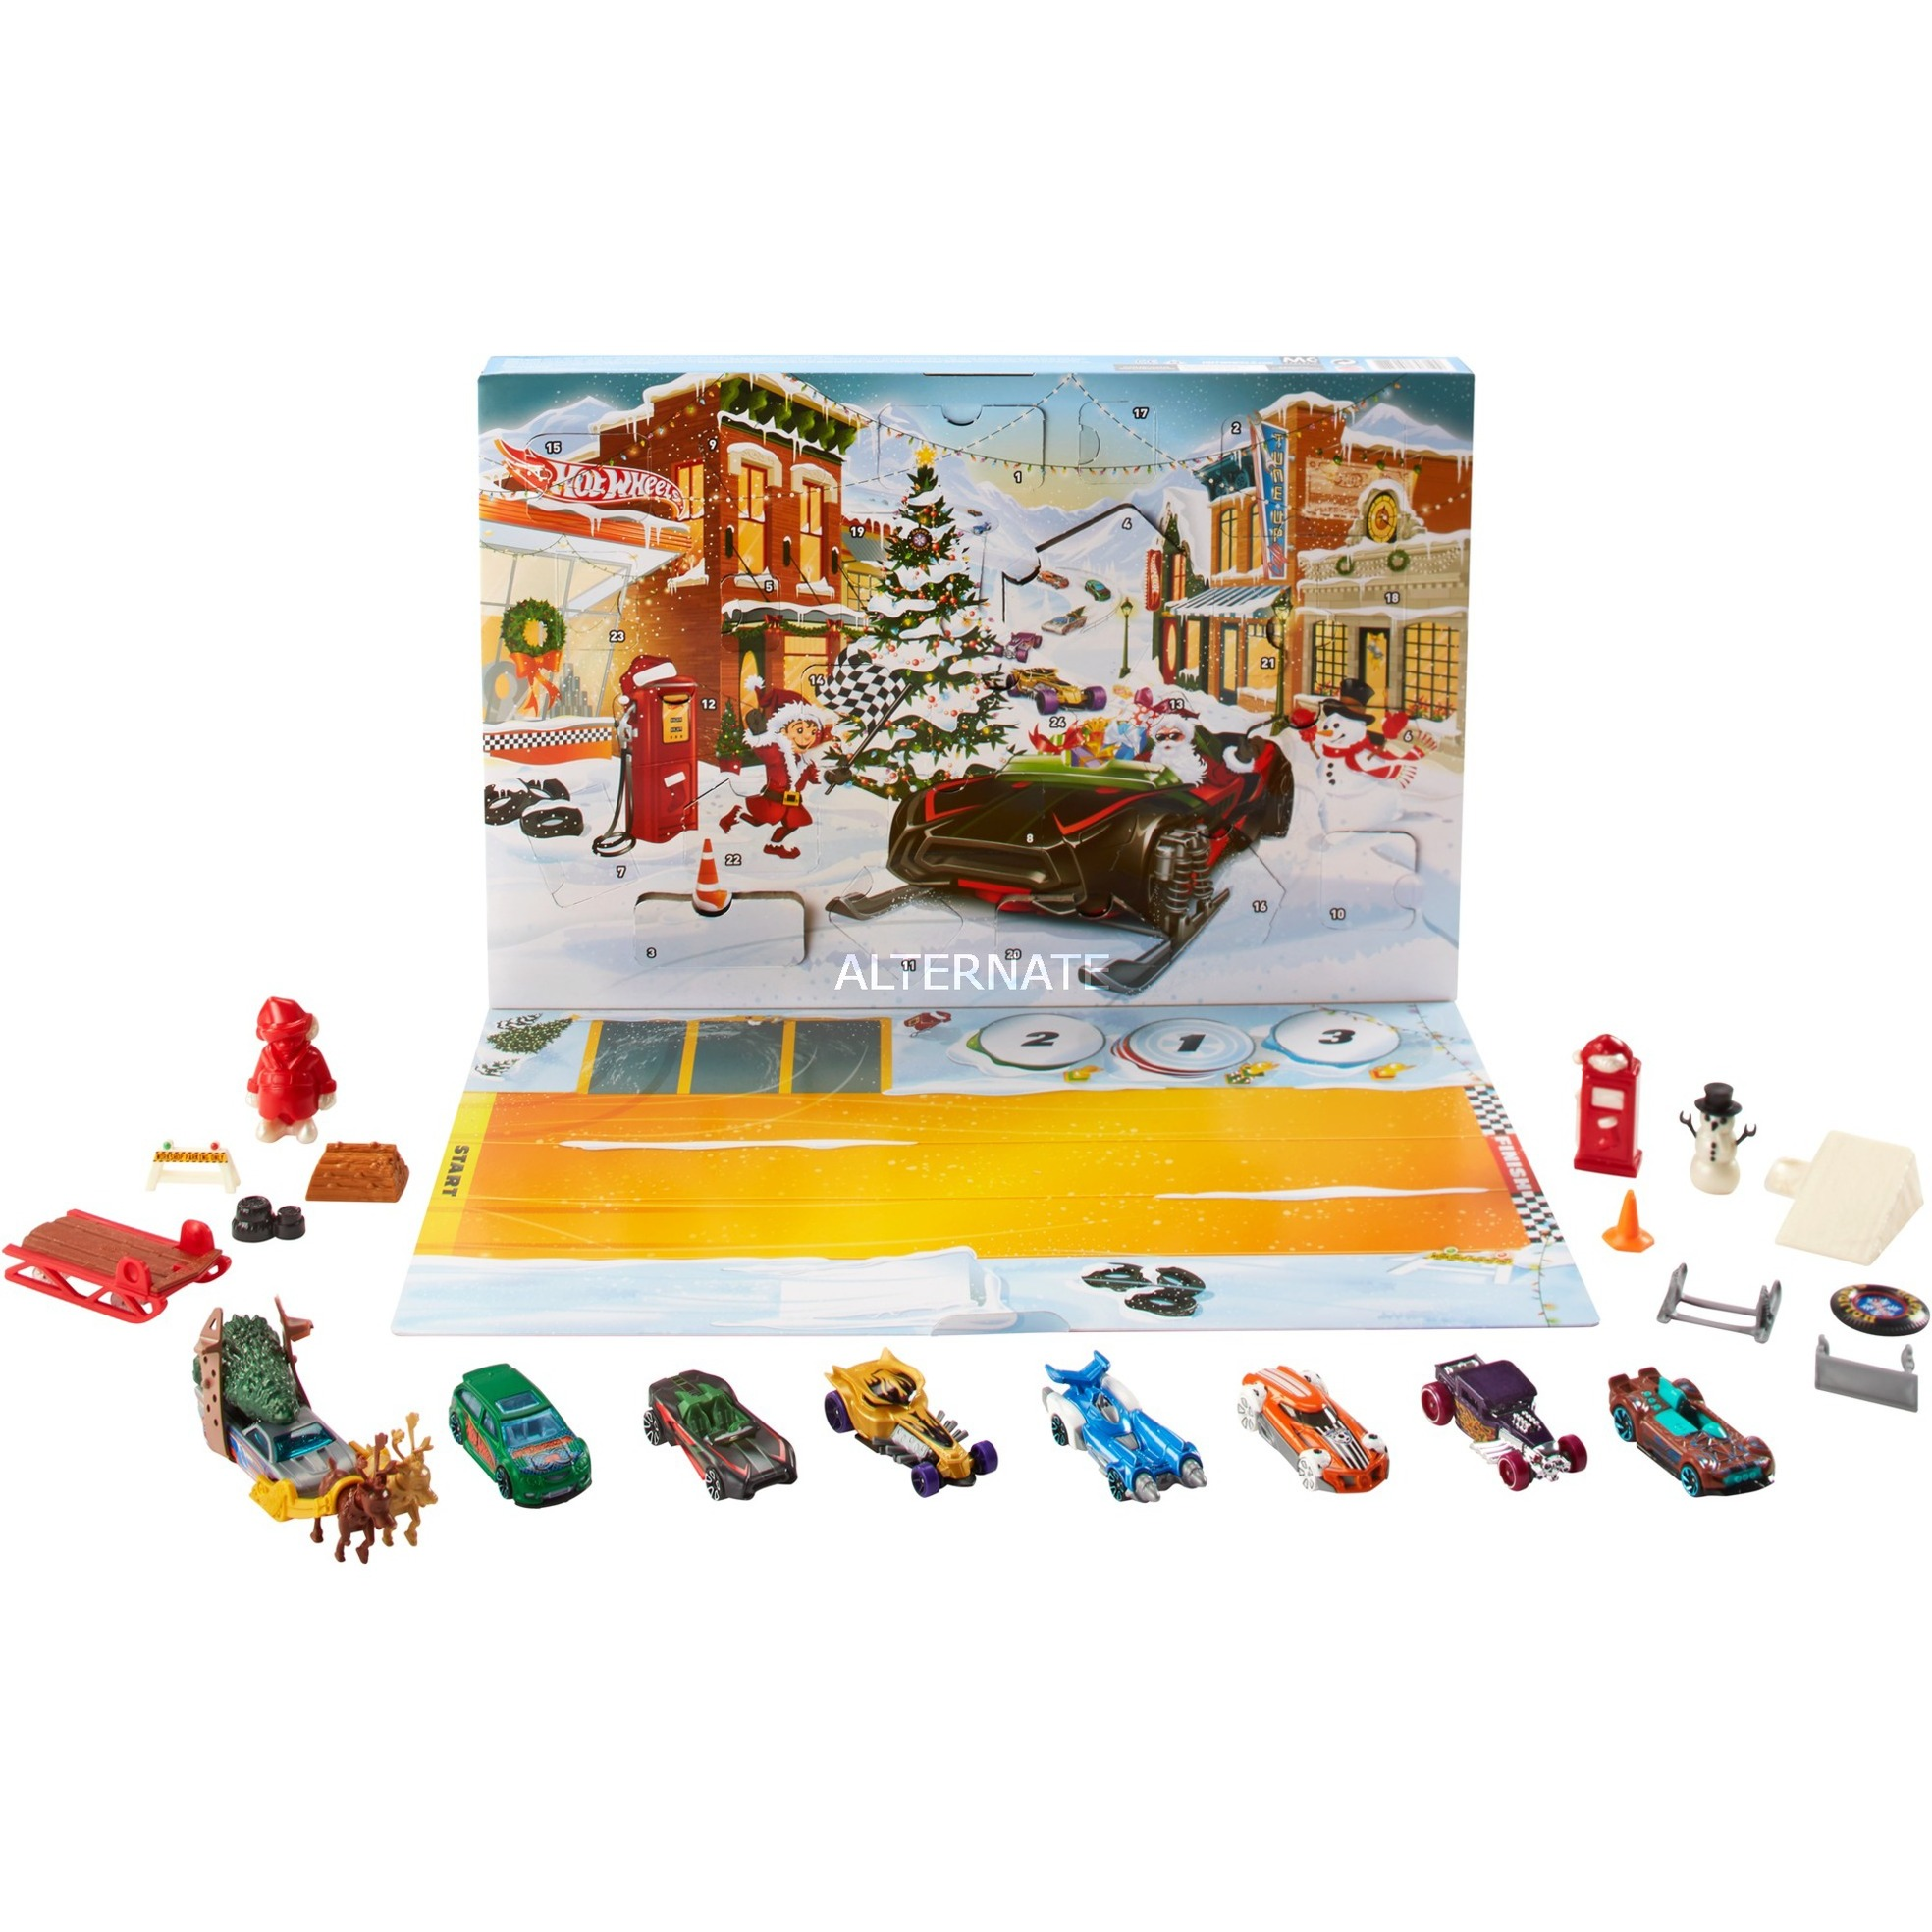 Weihnachtskalender Hot Wheels.Hw Adventskalender 2019